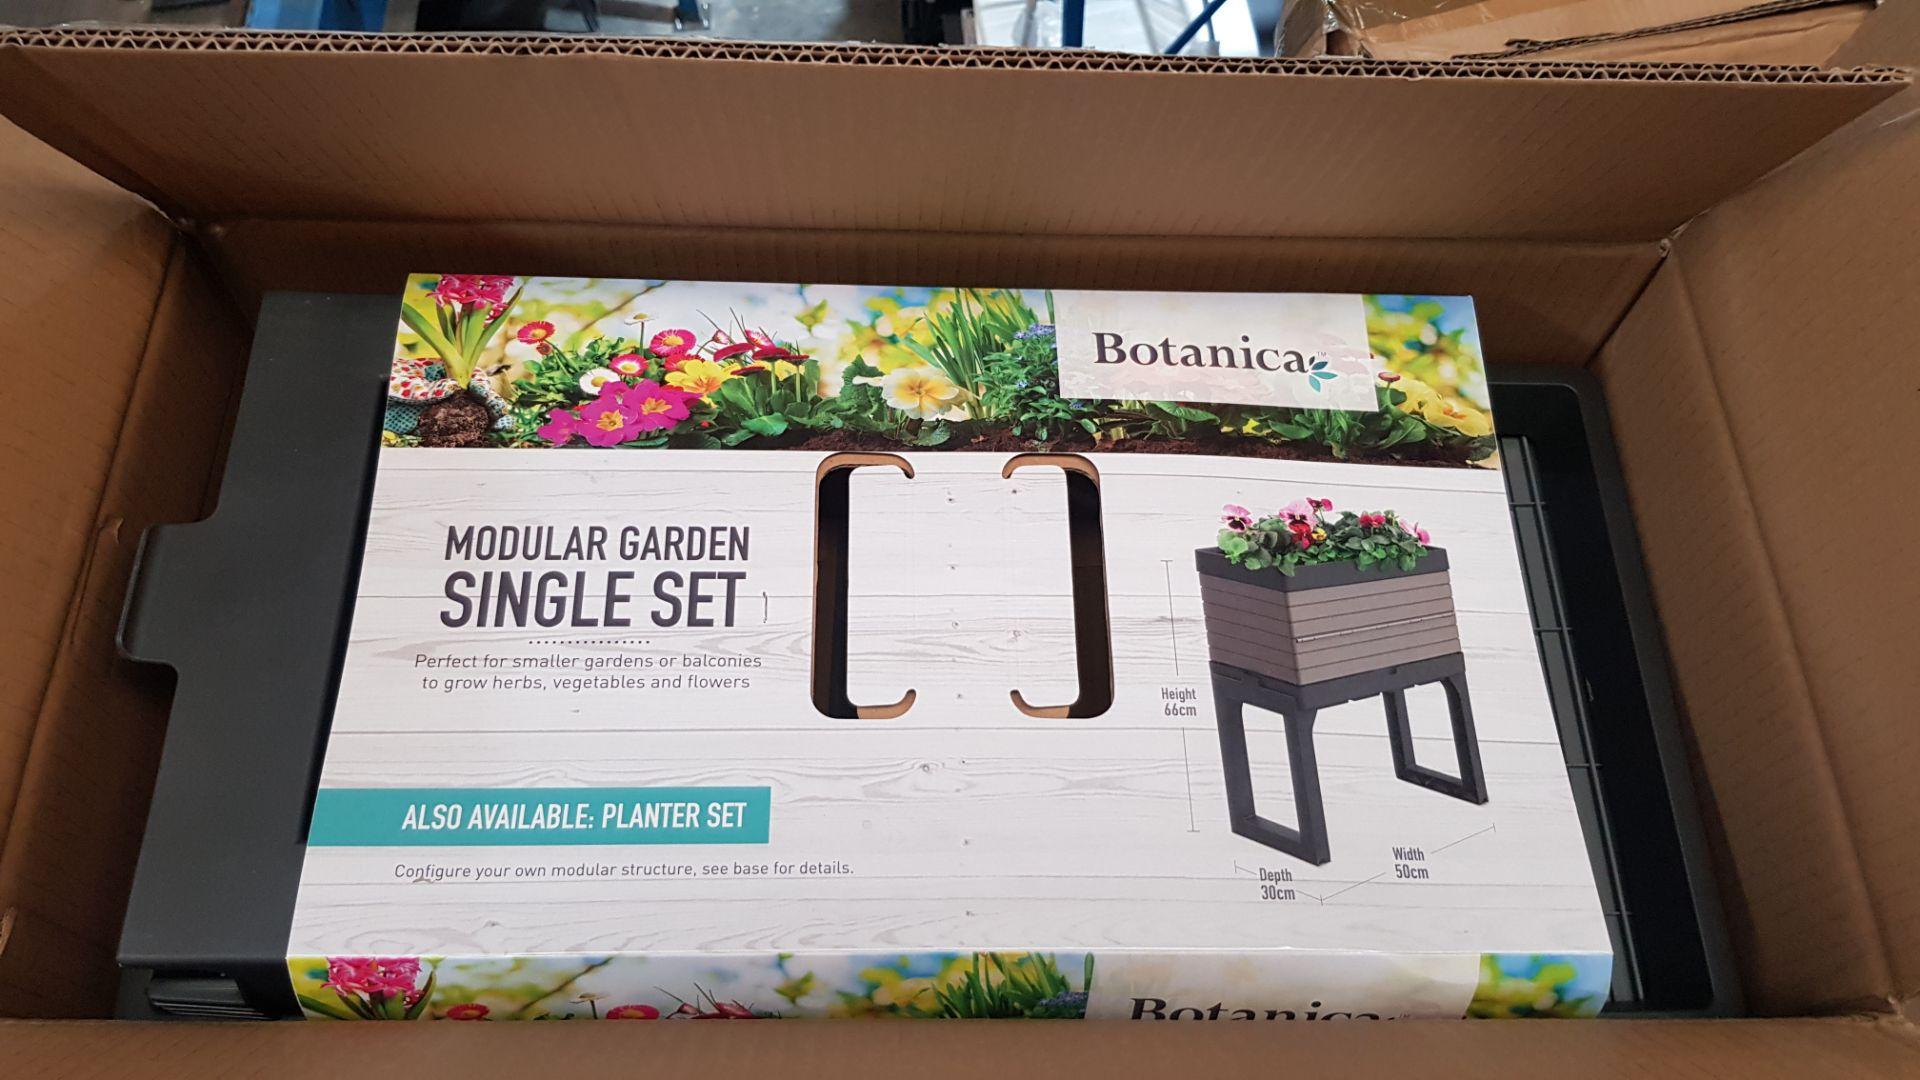 (P6) 2x Botanica Modular Garden Single Set Grey RRP £50 Each. New, Sealed Item. - Image 5 of 5